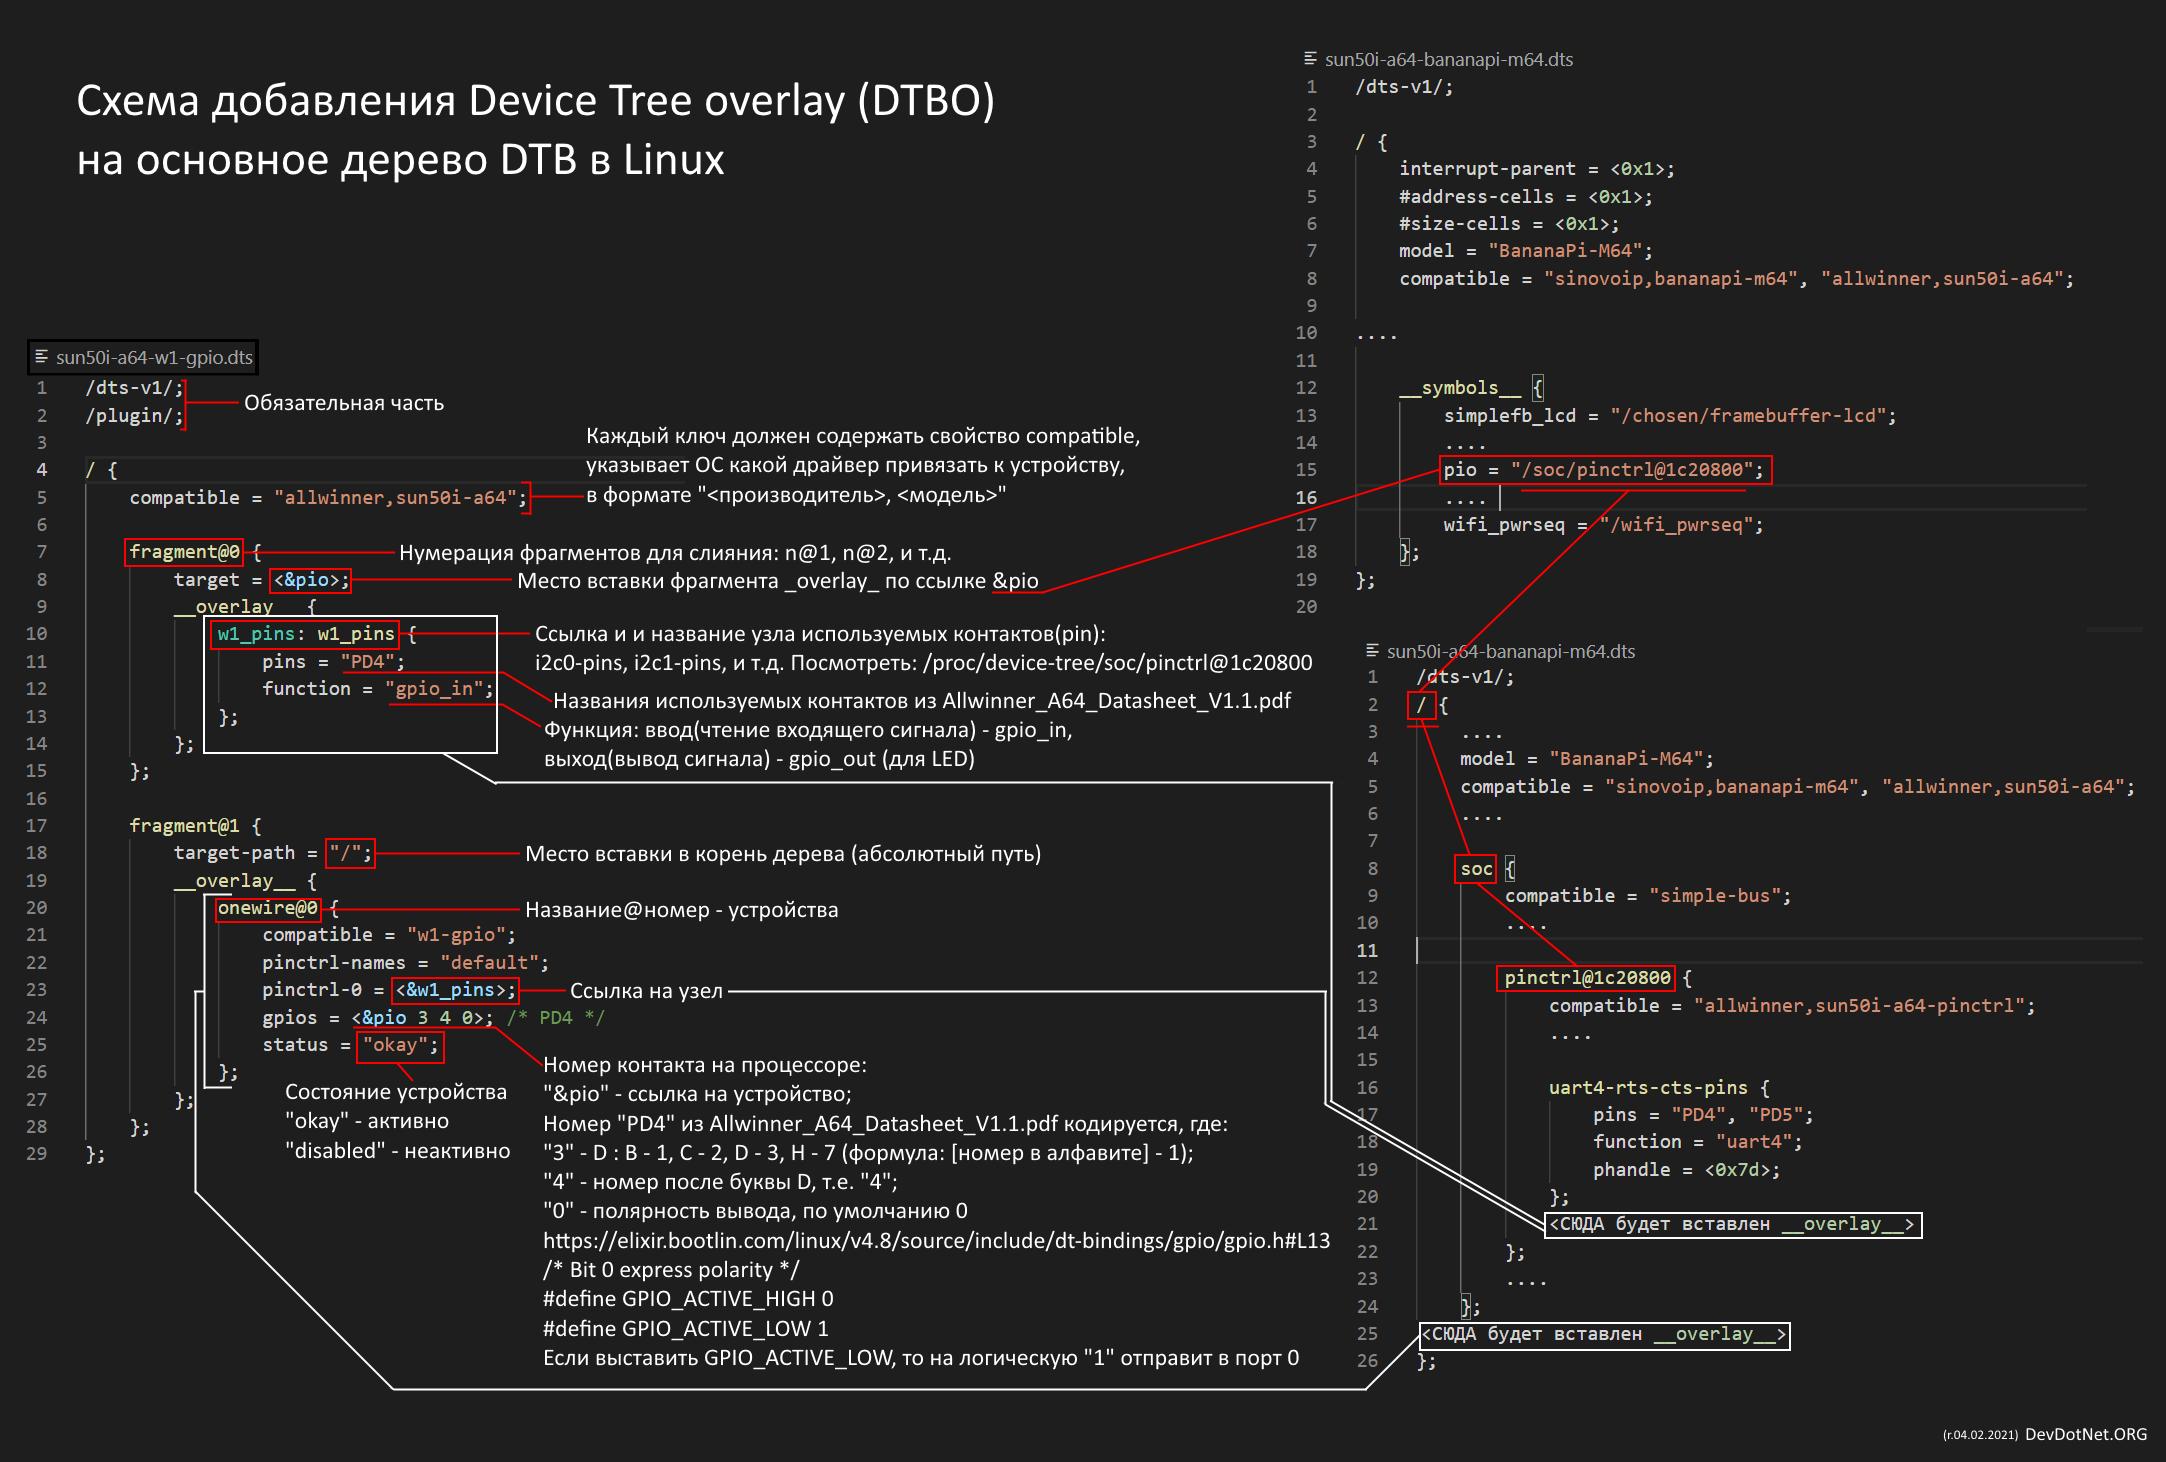 Device tree bpi m64 1-wire